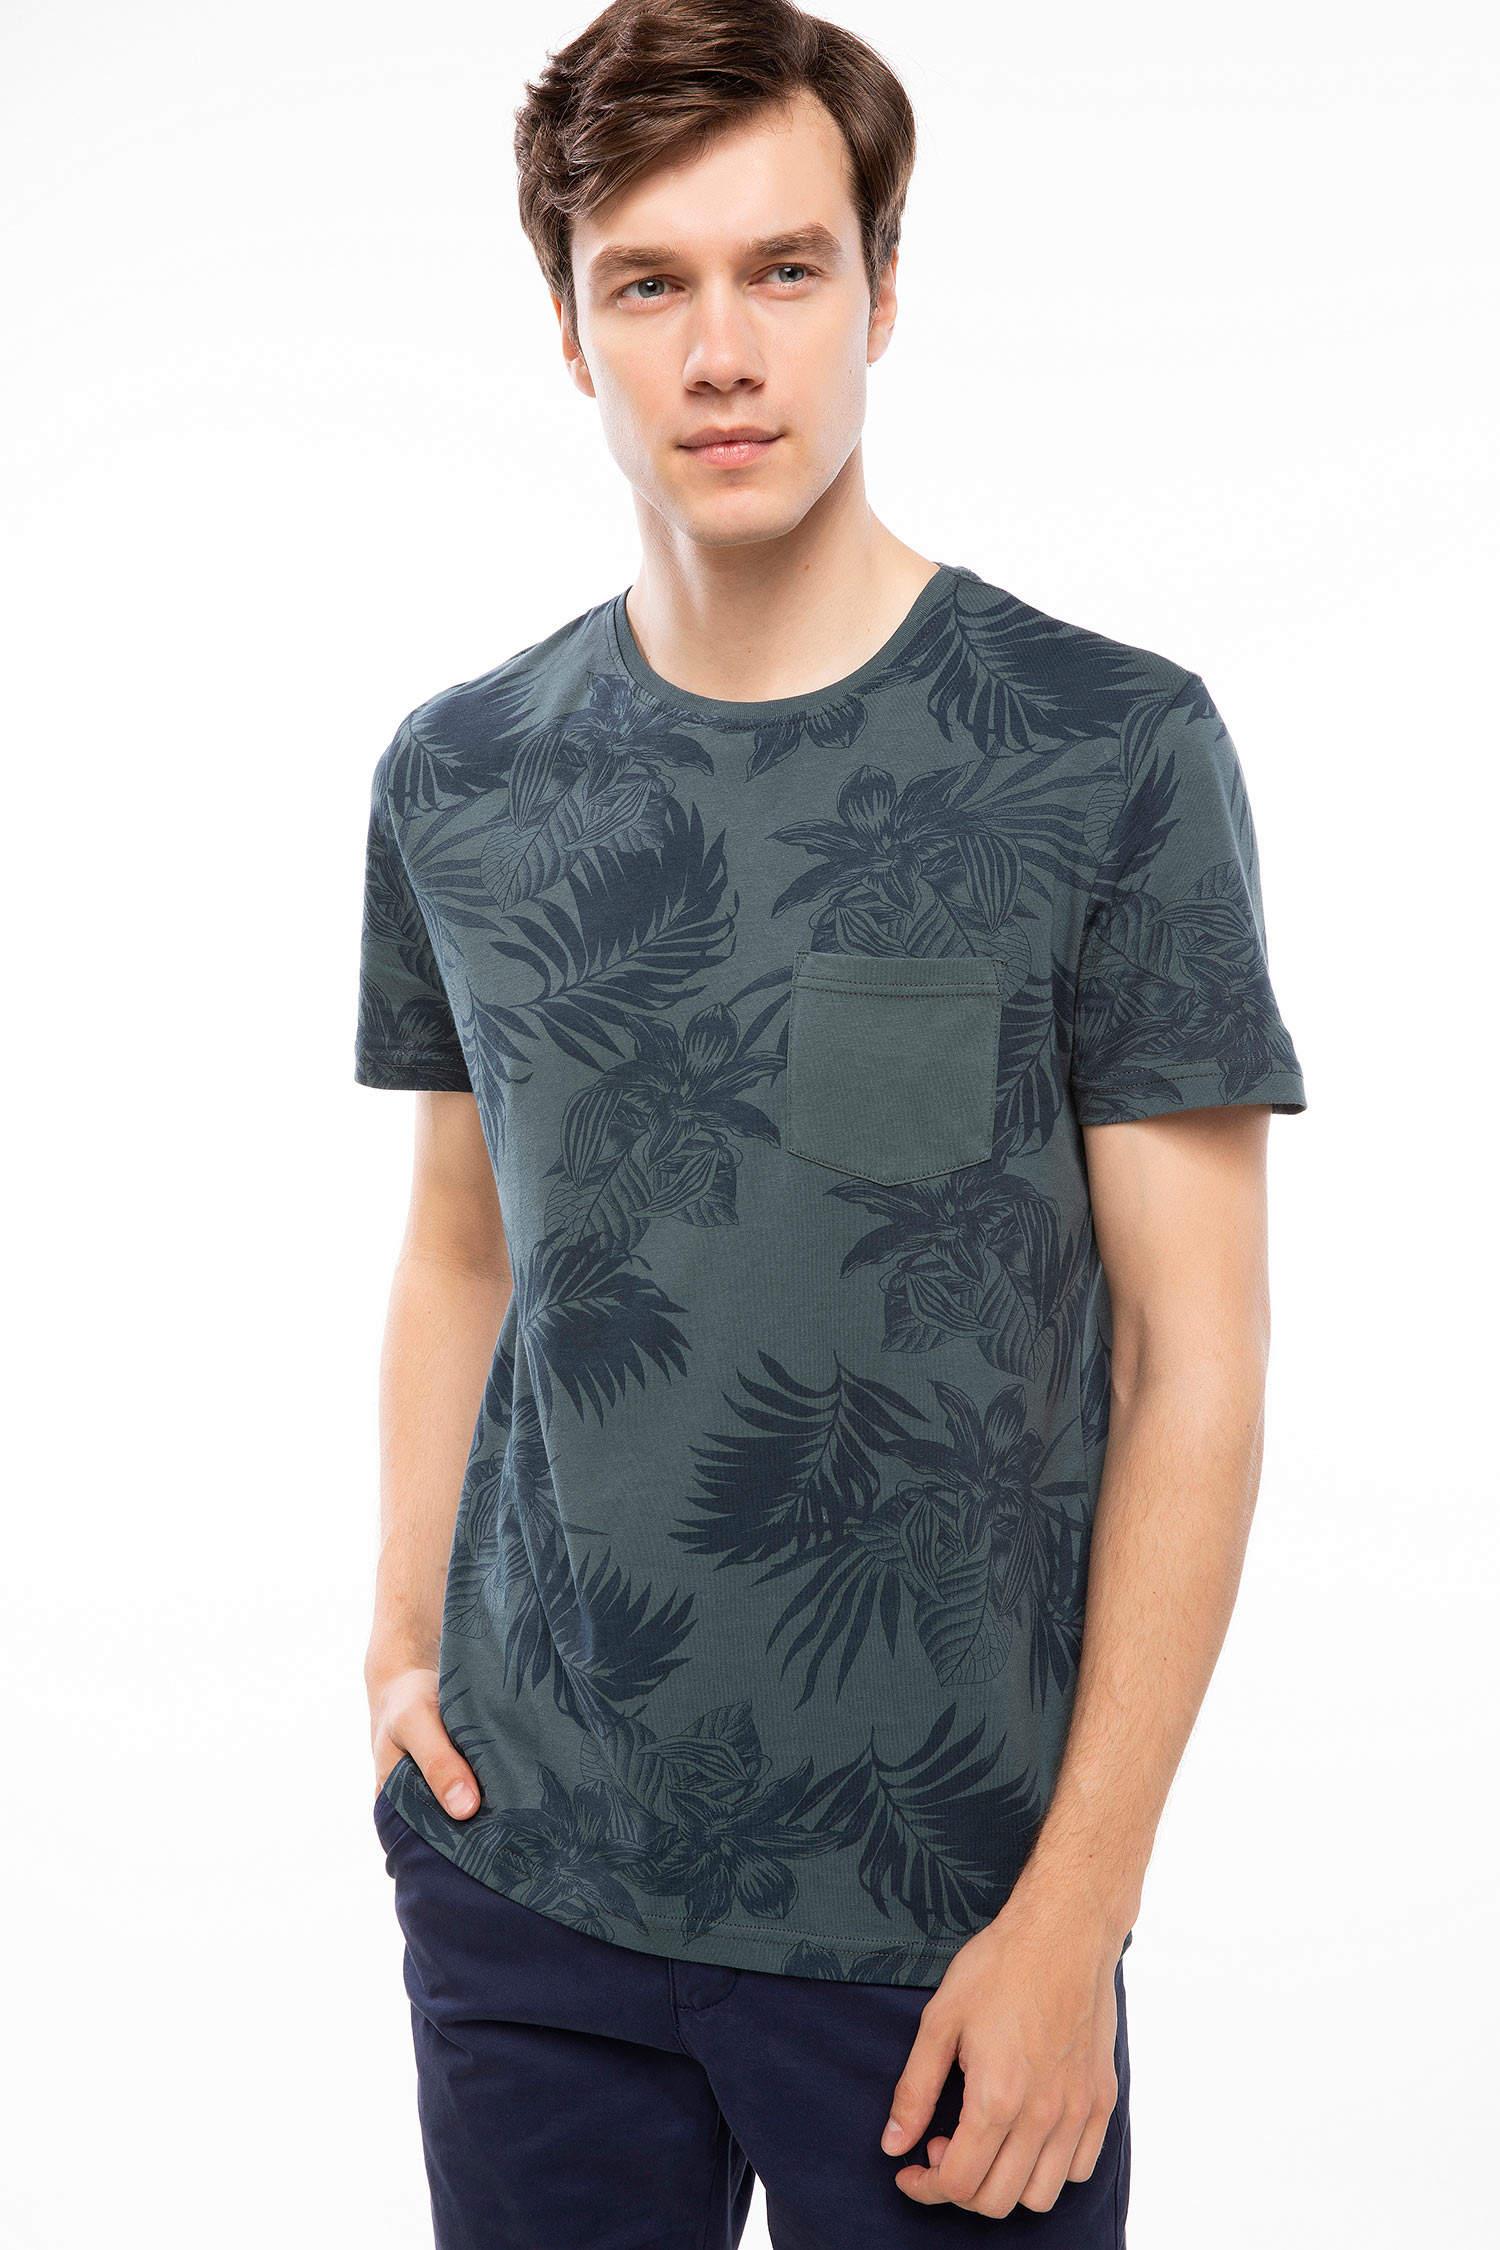 a3a291dbe9fdb PETROL Erkek Yaprak Desenli T-shirt 888237 | DeFacto